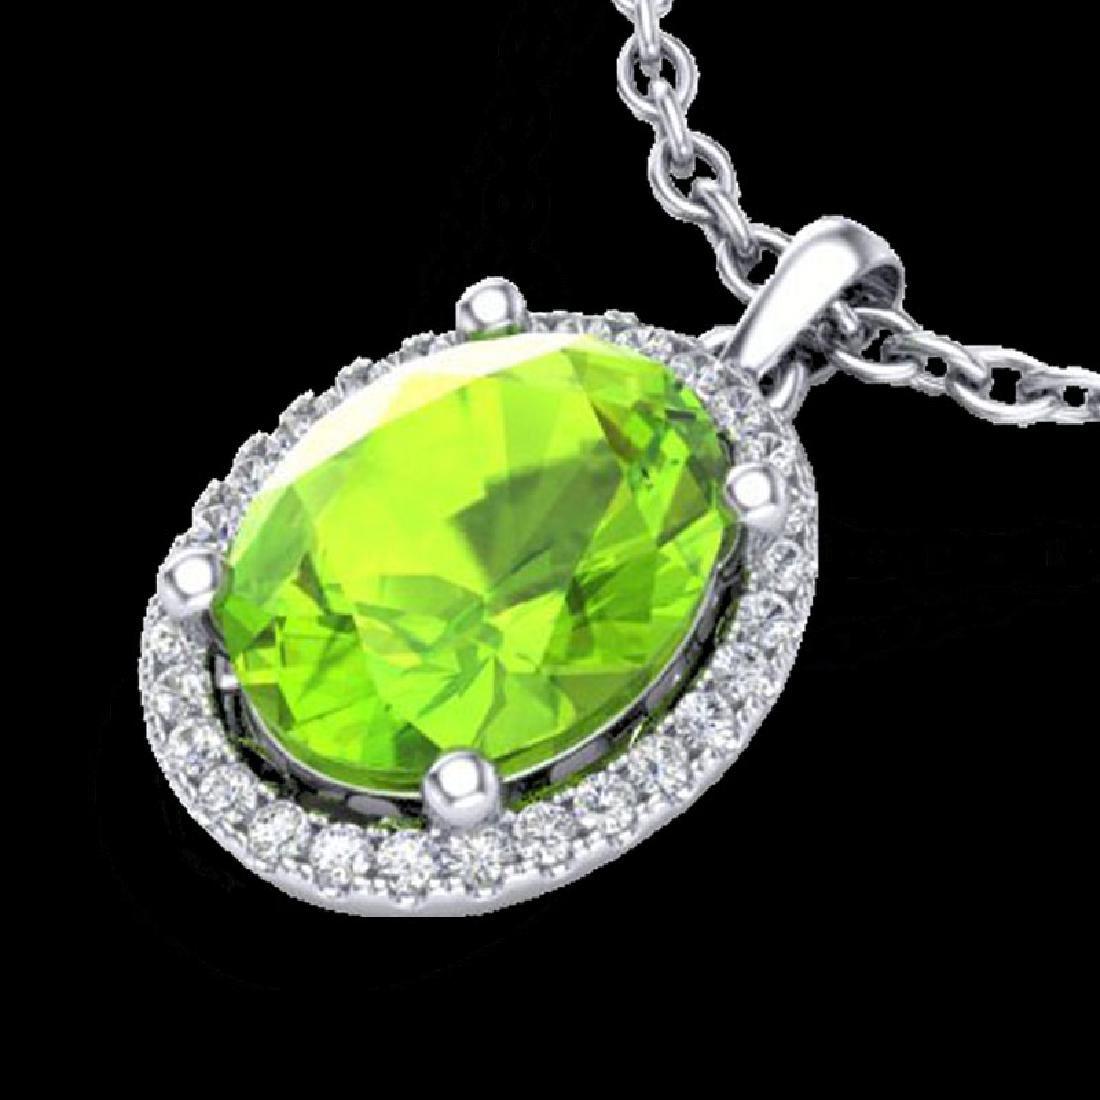 2.50 CTW Peridot & Micro Pave VS/SI Diamond Necklace